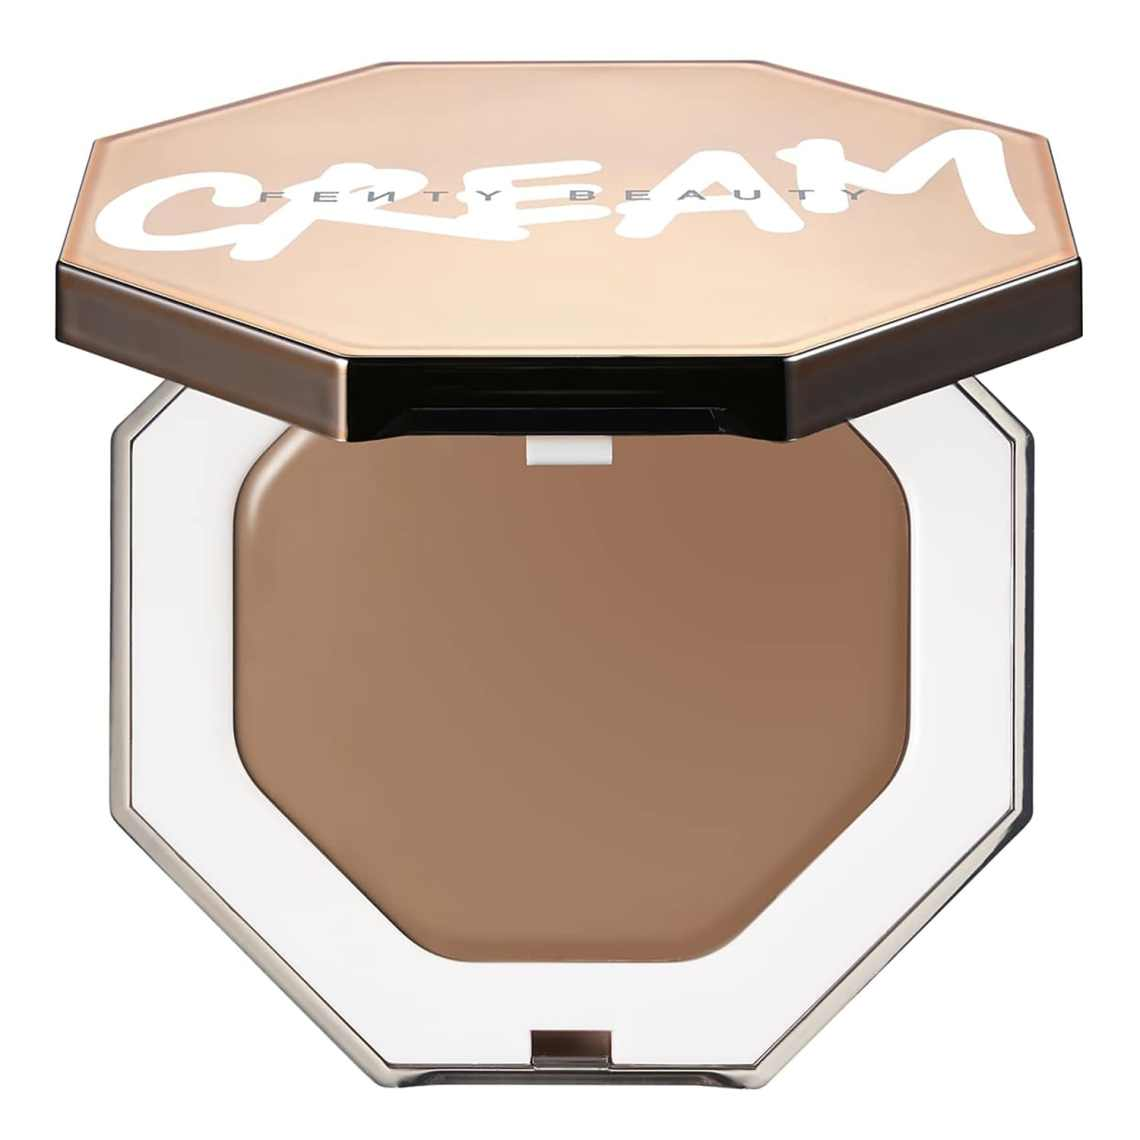 Fenty Beauty Cheeks Out Freestyle Cream Bronzer – Butta Biscuit